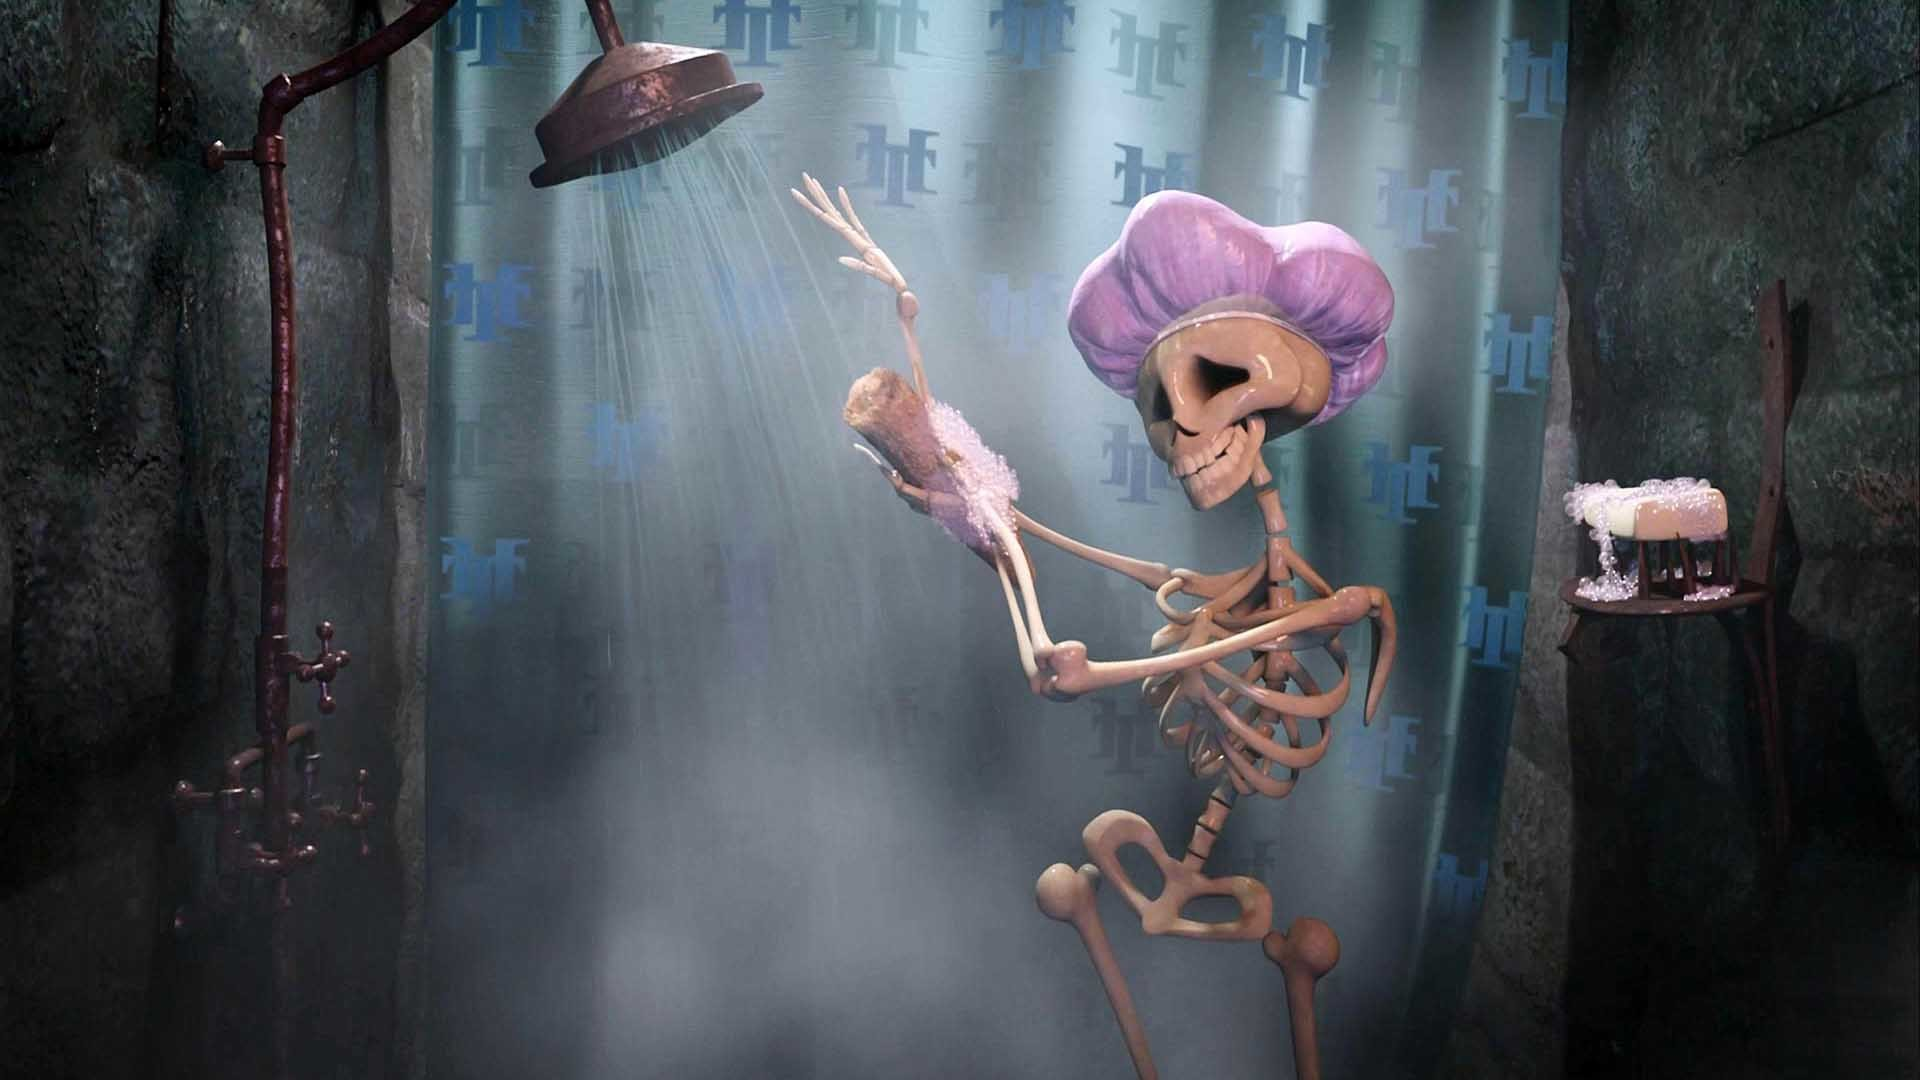 funny-skeletion-creepy-halloween-wallpaper-full-hd – The Holiday. Funny  Skeletion Creepy Halloween Wallpaper Full Hd The Holiday